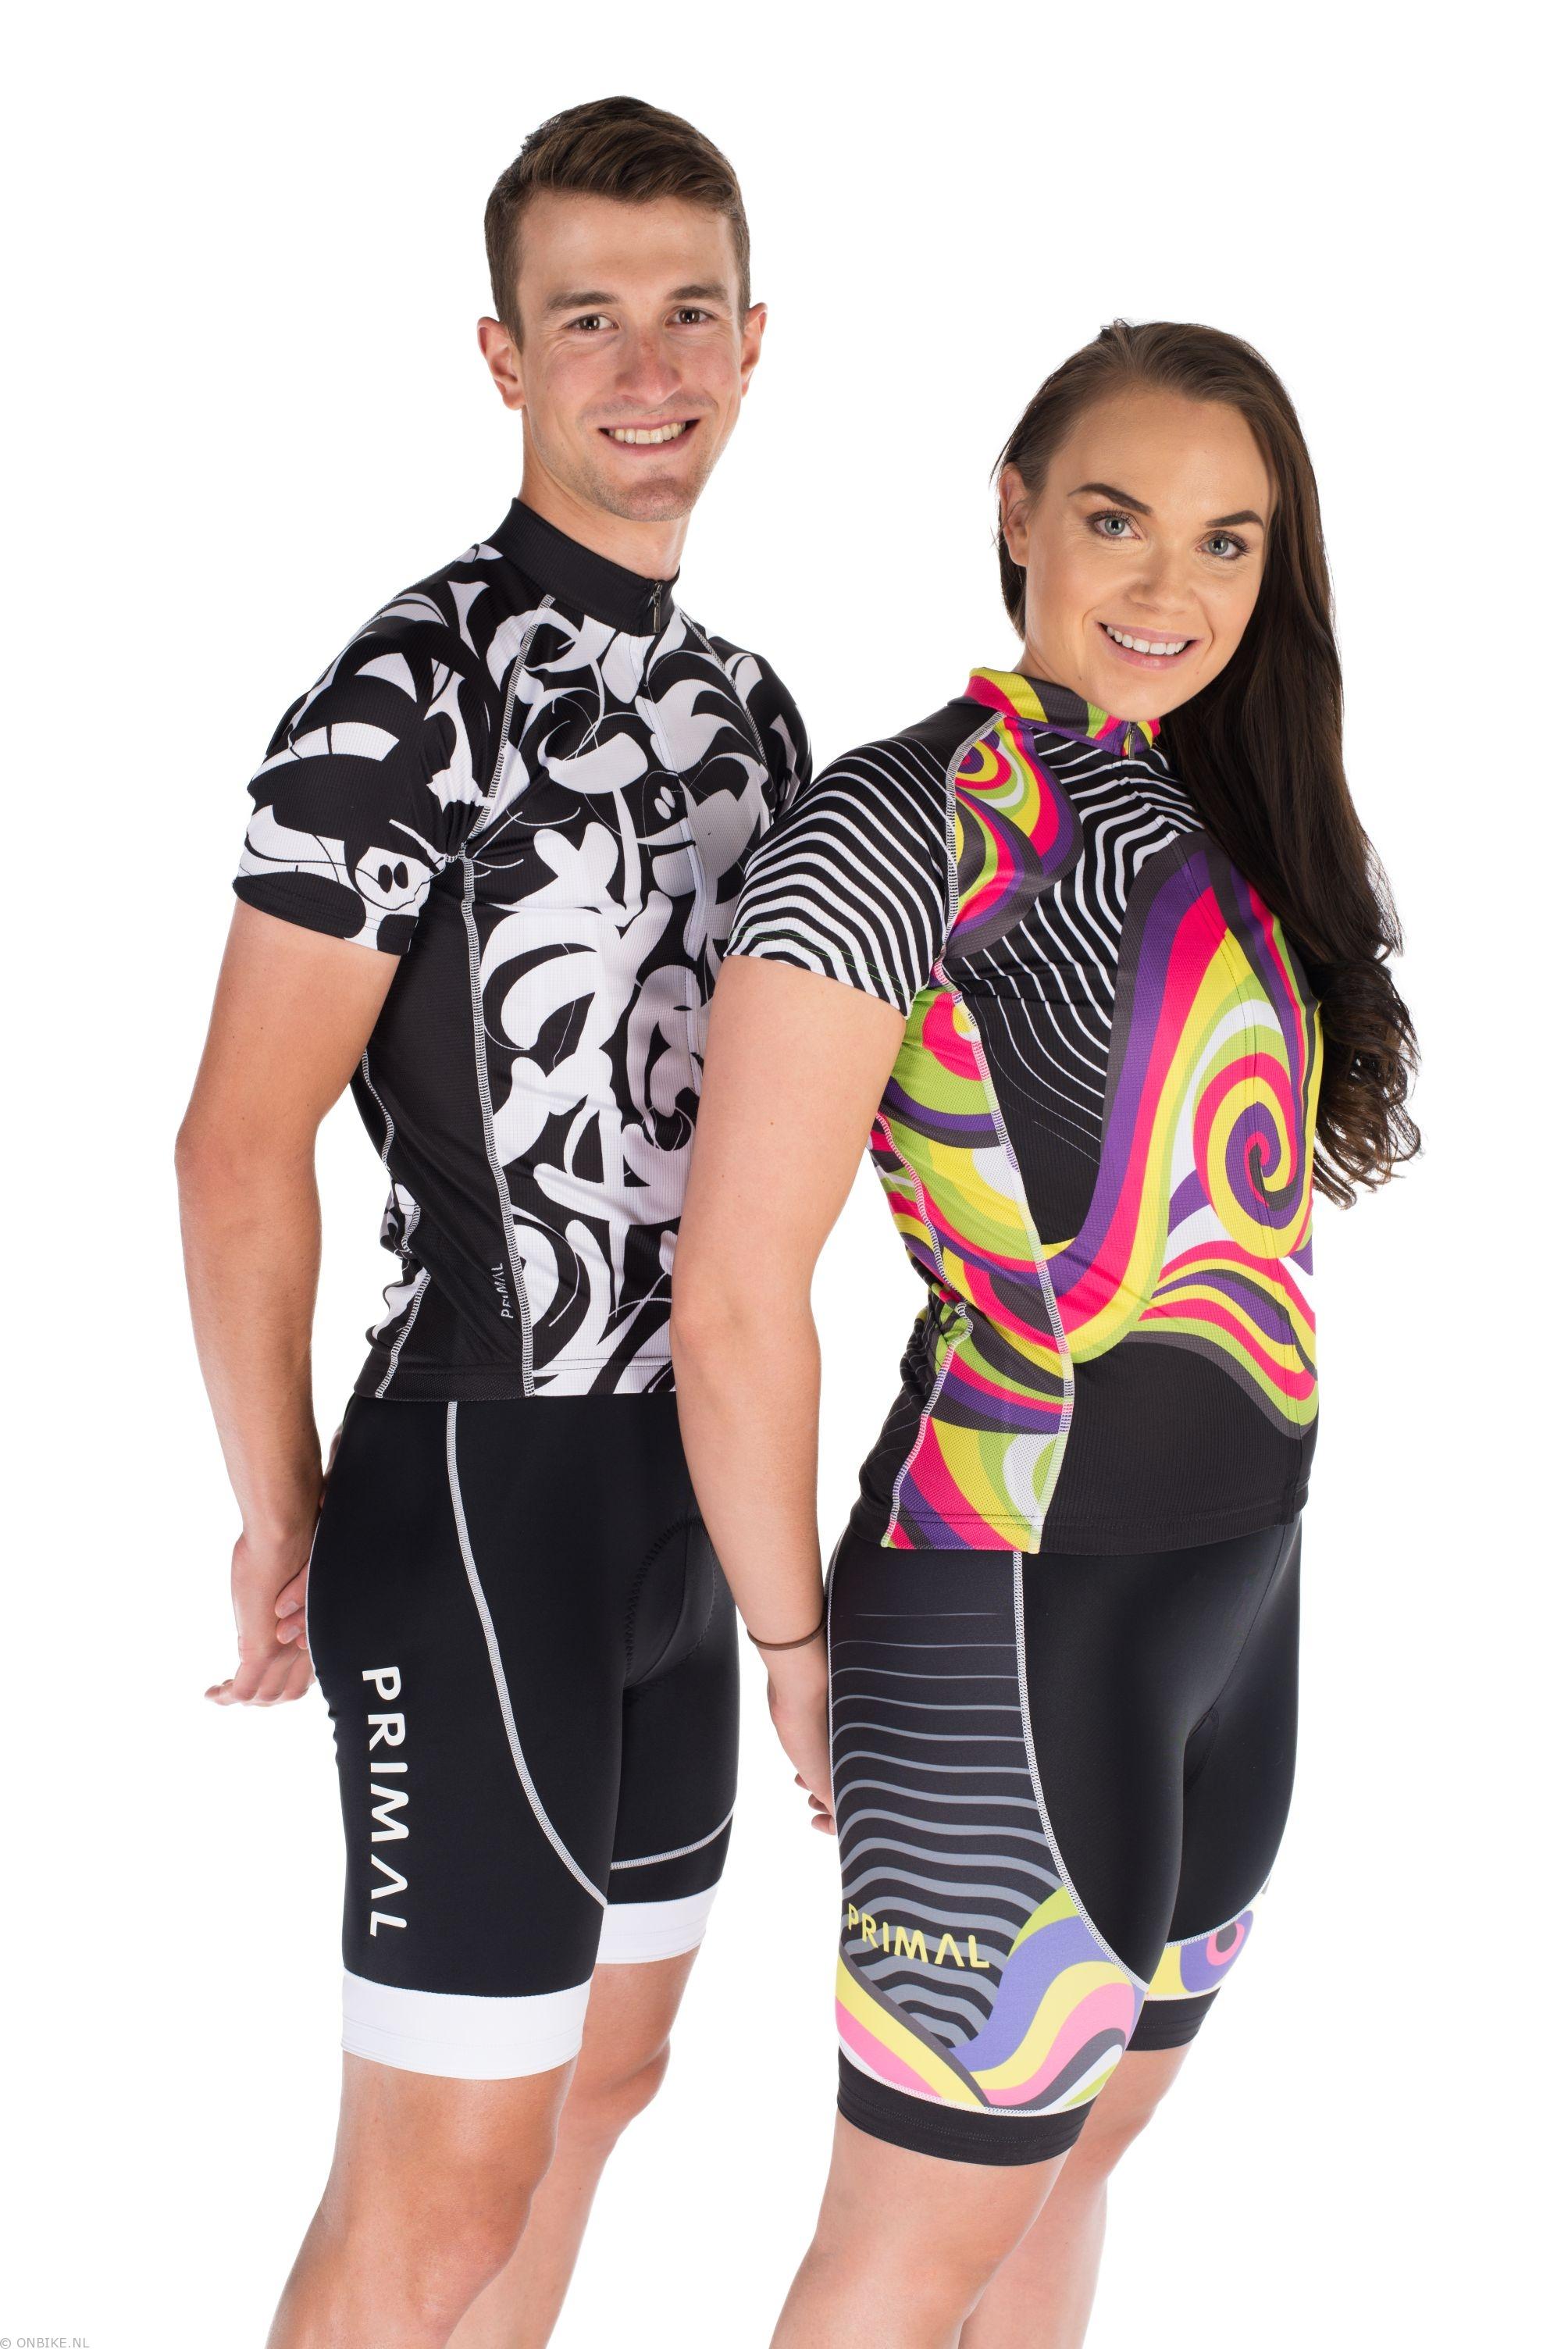 Primal wear fietskleding collectie 2018